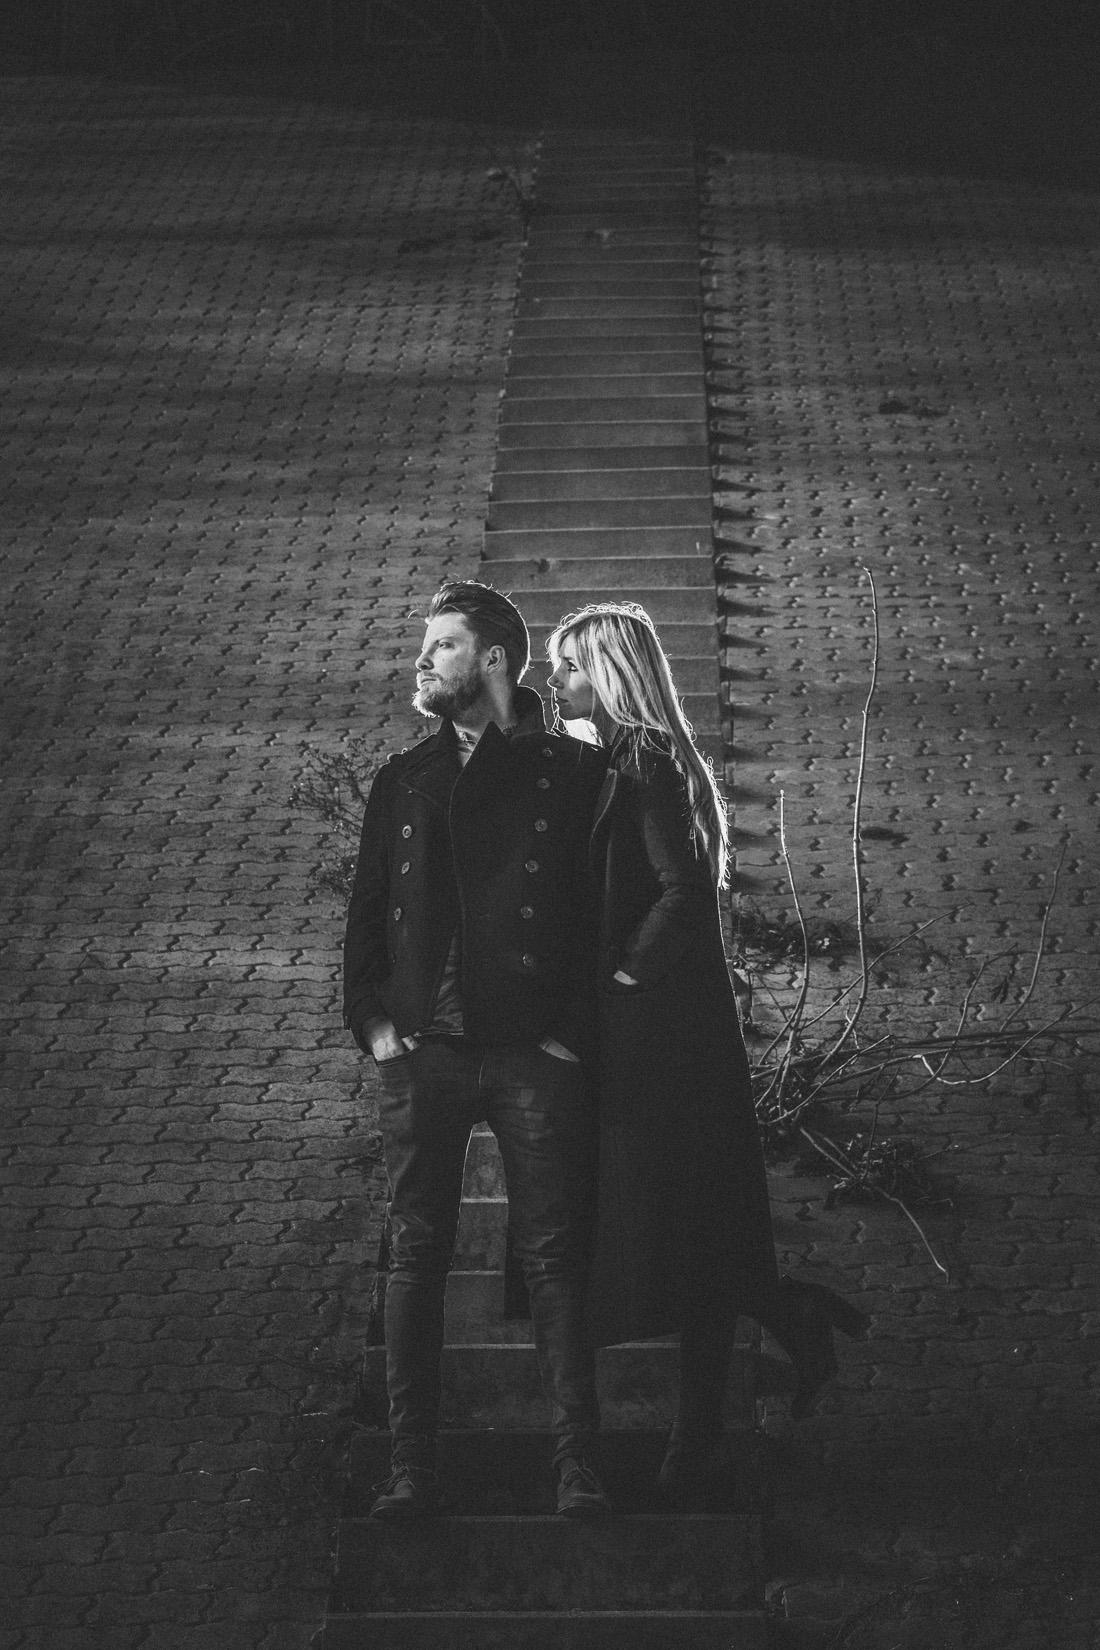 Paar Shooting mit Amantani & Moritz * 12. Februar 2017 * Paarfotografie und Paarporträts * Rossi Photography * Paarfotograf Gießen